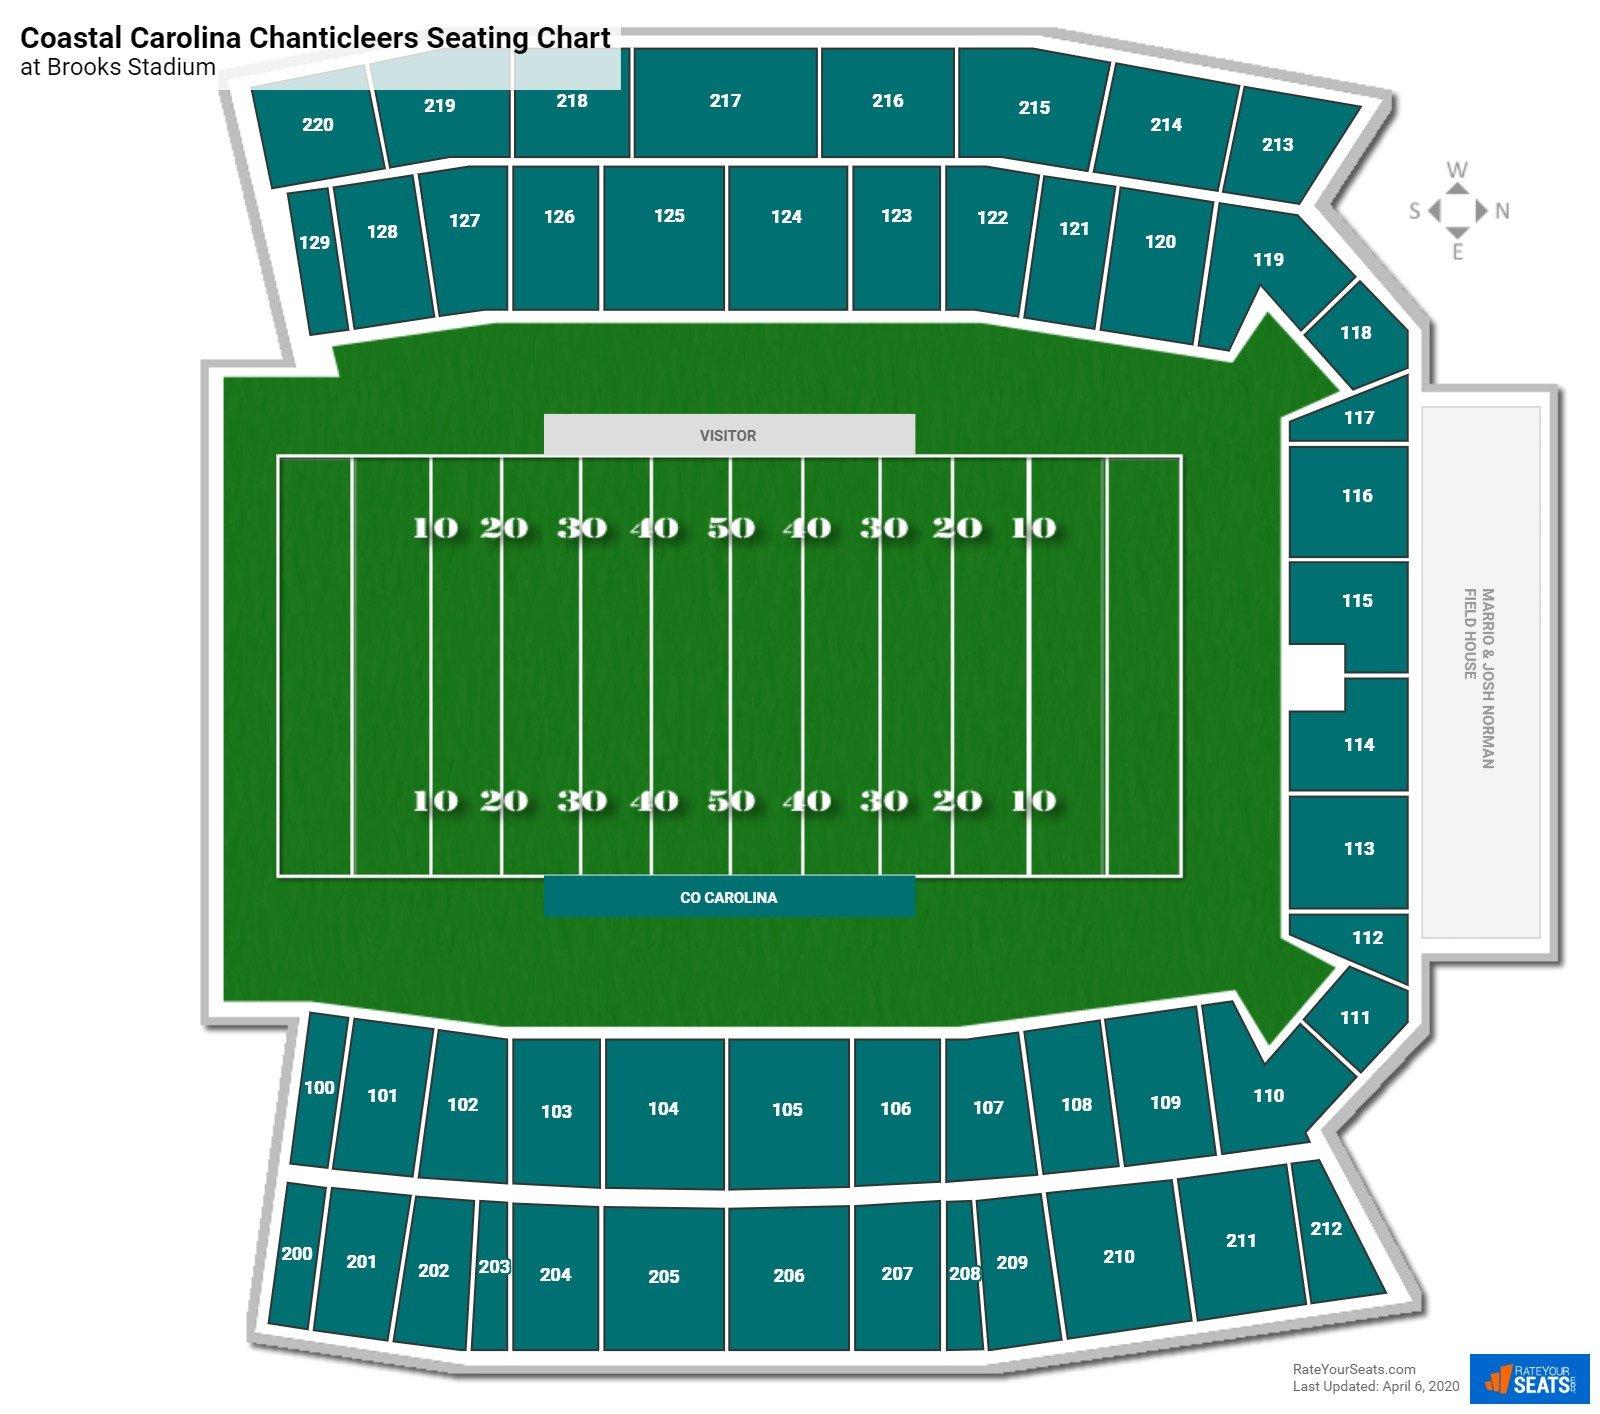 Brooks Stadium Seating Charts Rateyourseats Com